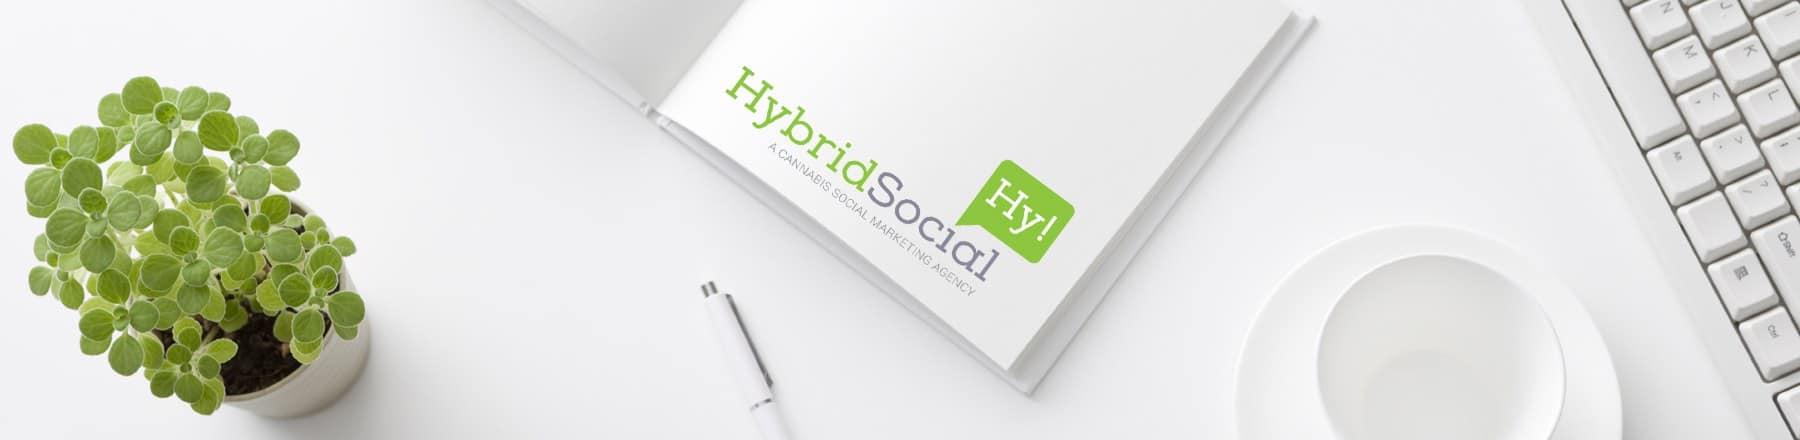 Hybrid Social